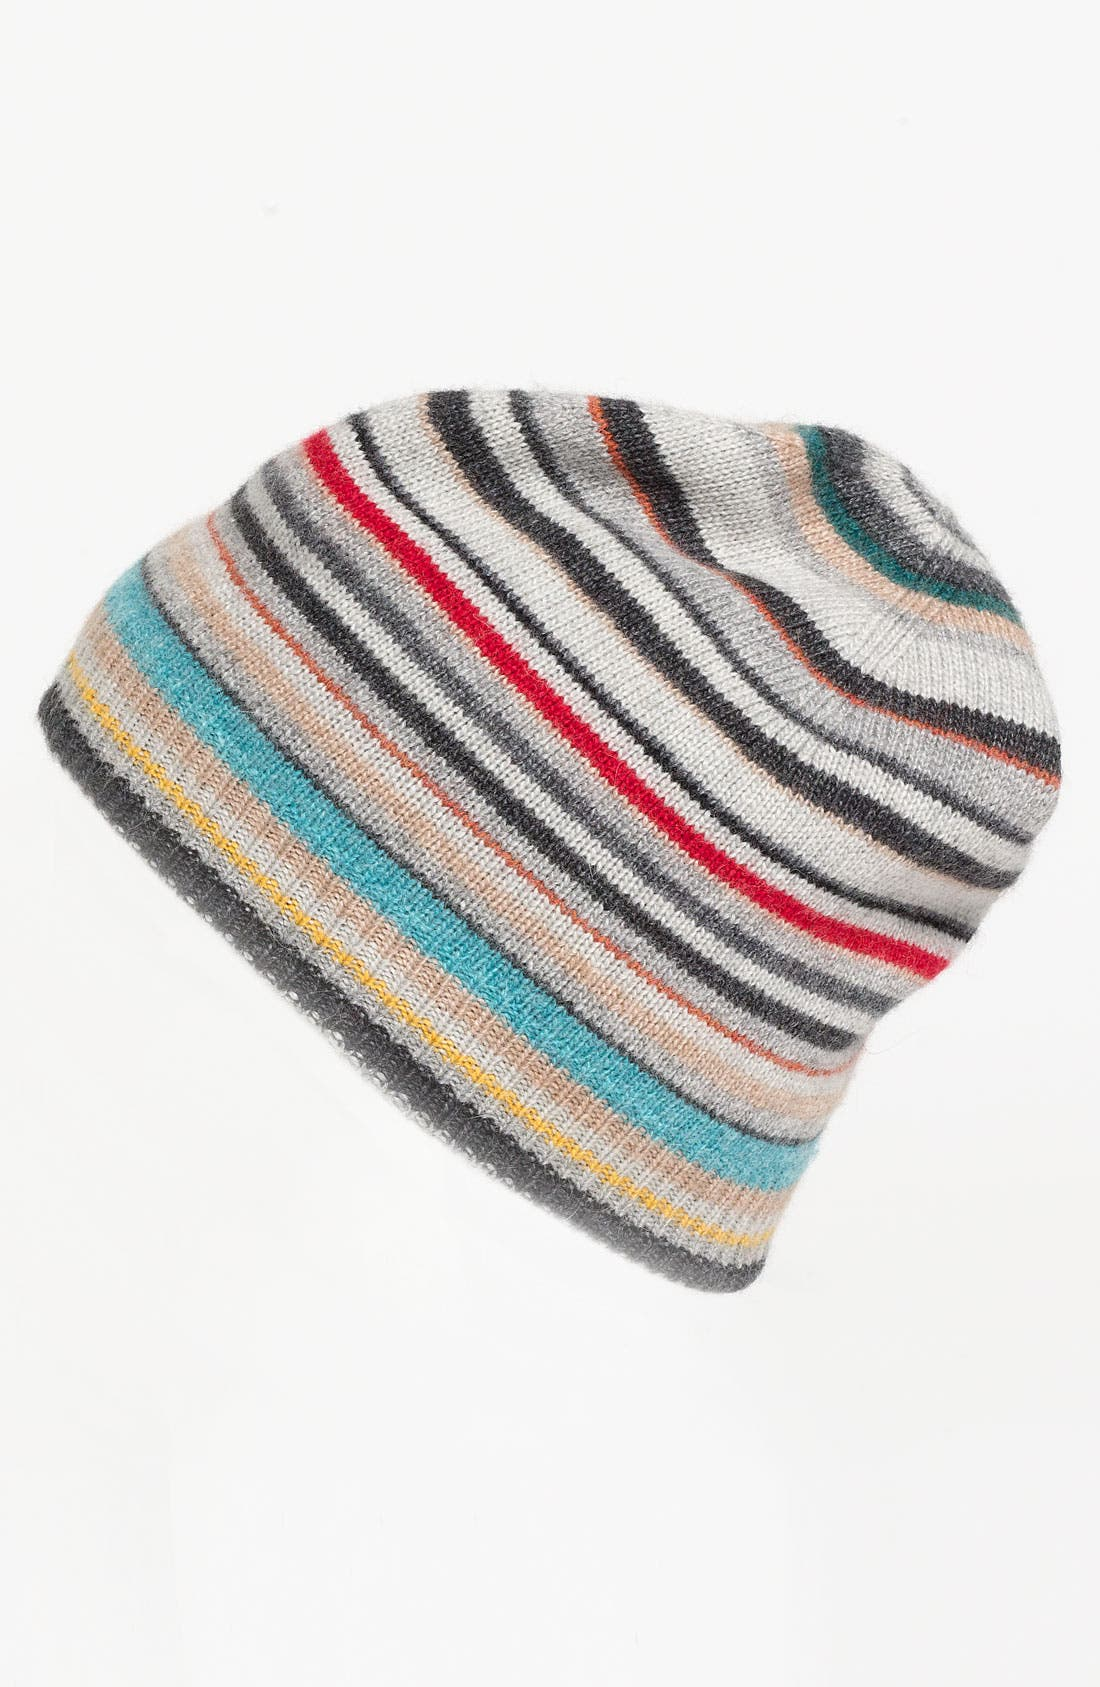 Main Image - Paul Smith Accessories Stripe Knit Cap